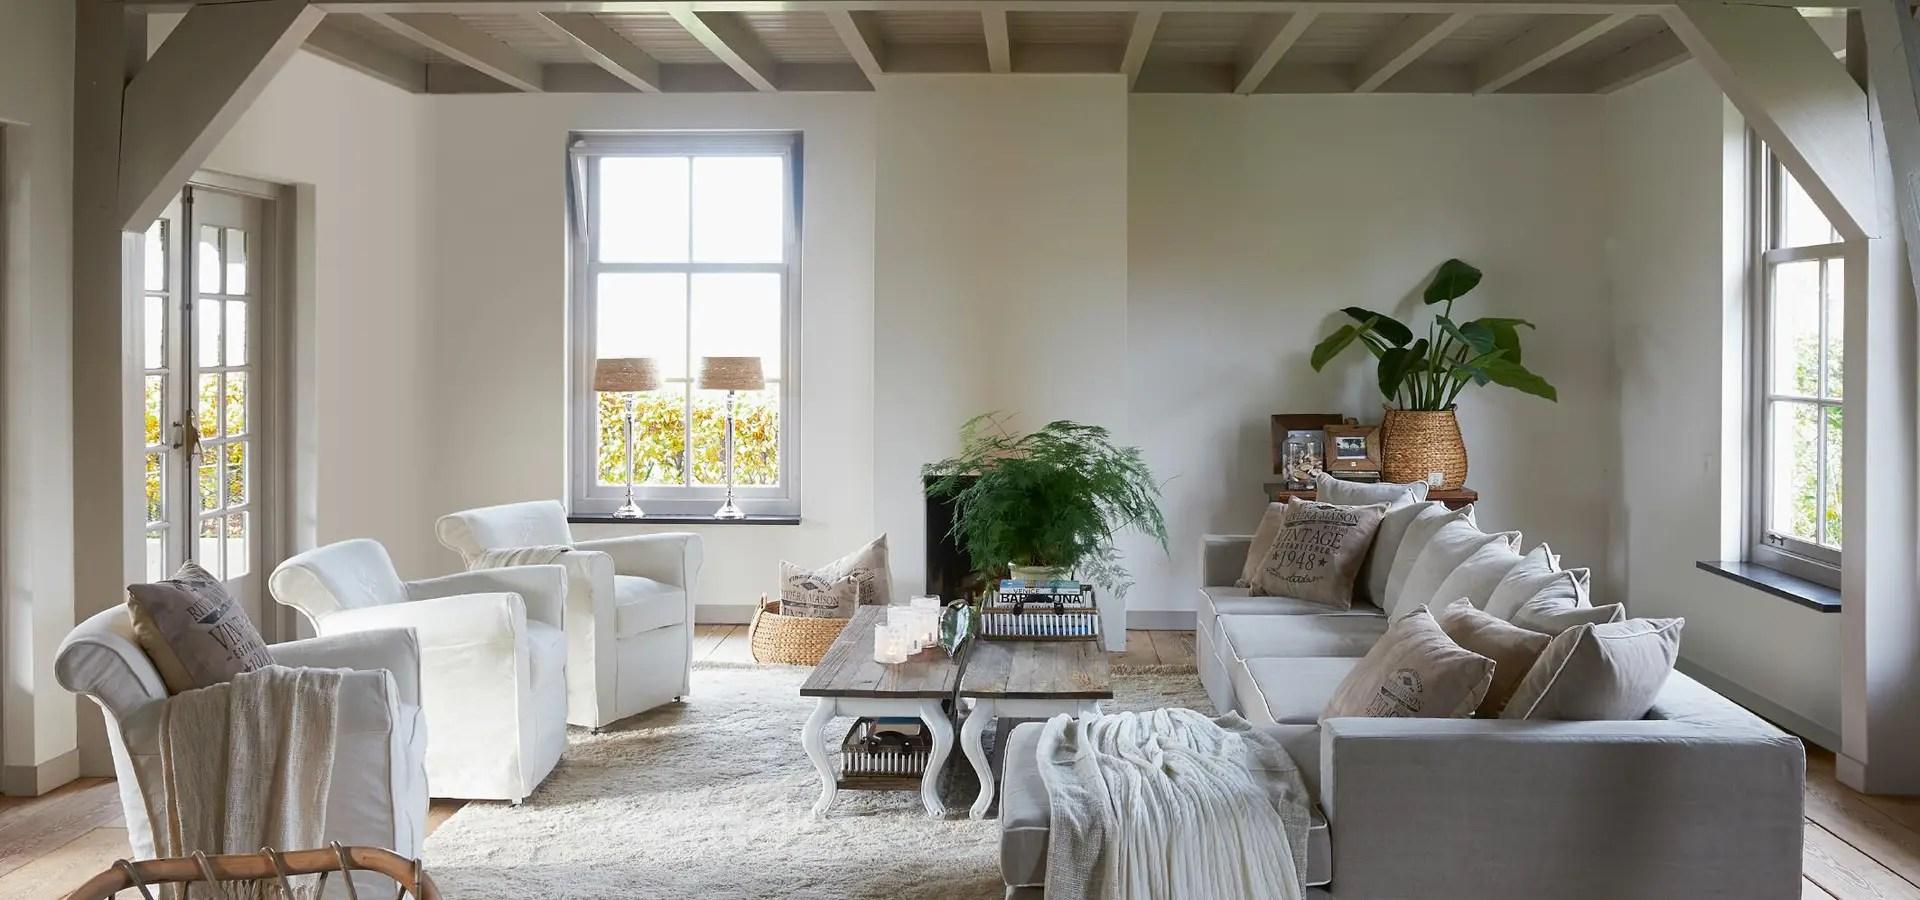 Villa Riviera Mbel  Accessoires in Khlungsborn  homify